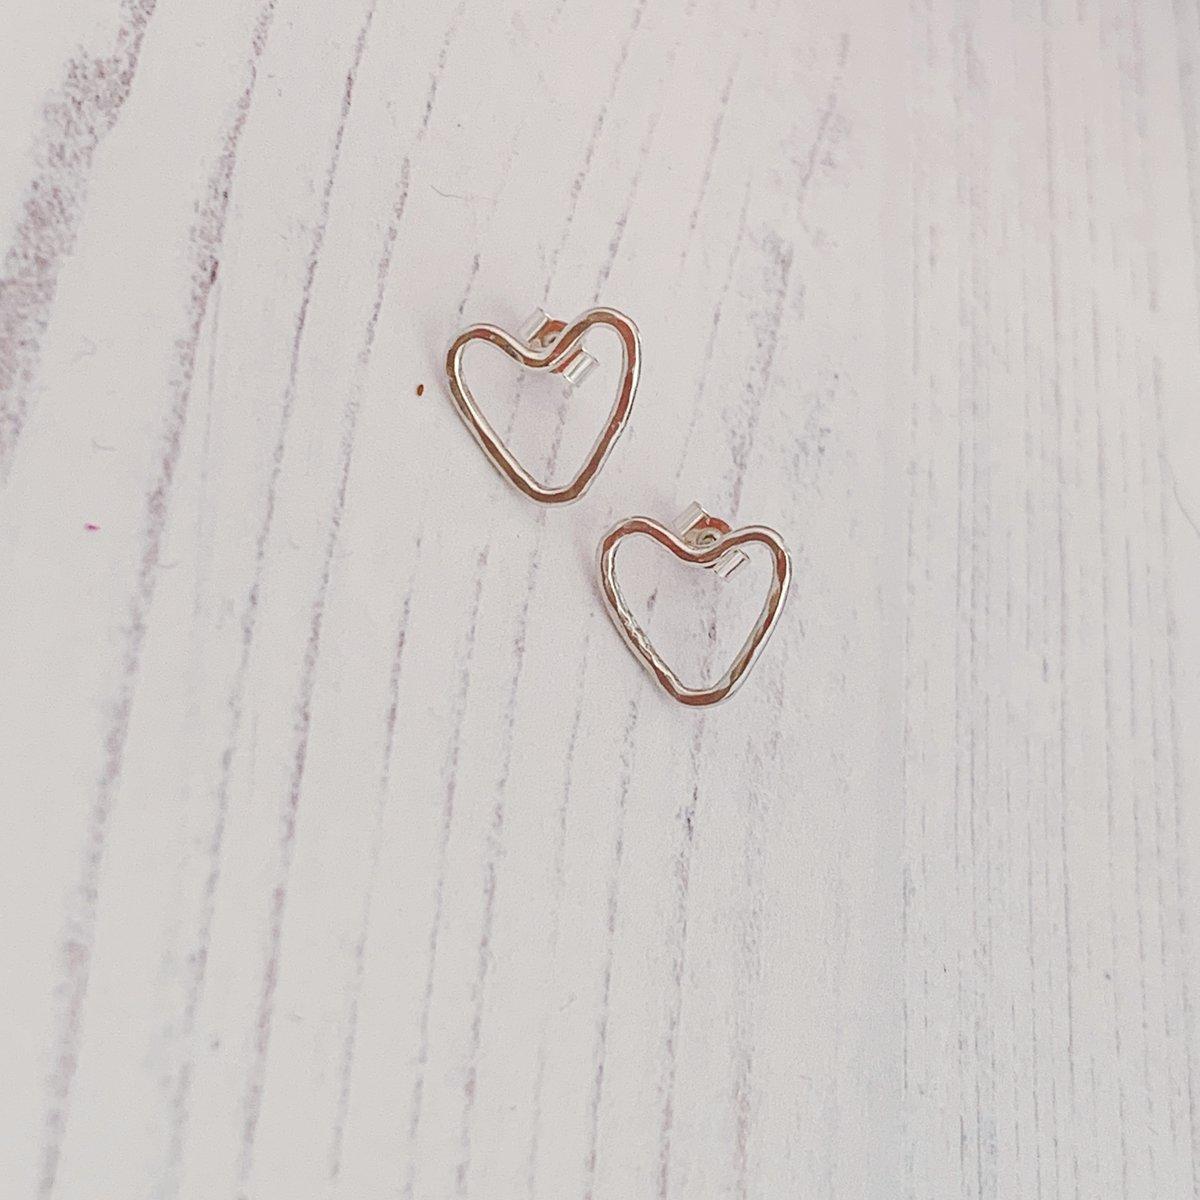 Image of Heart outline stud earrings